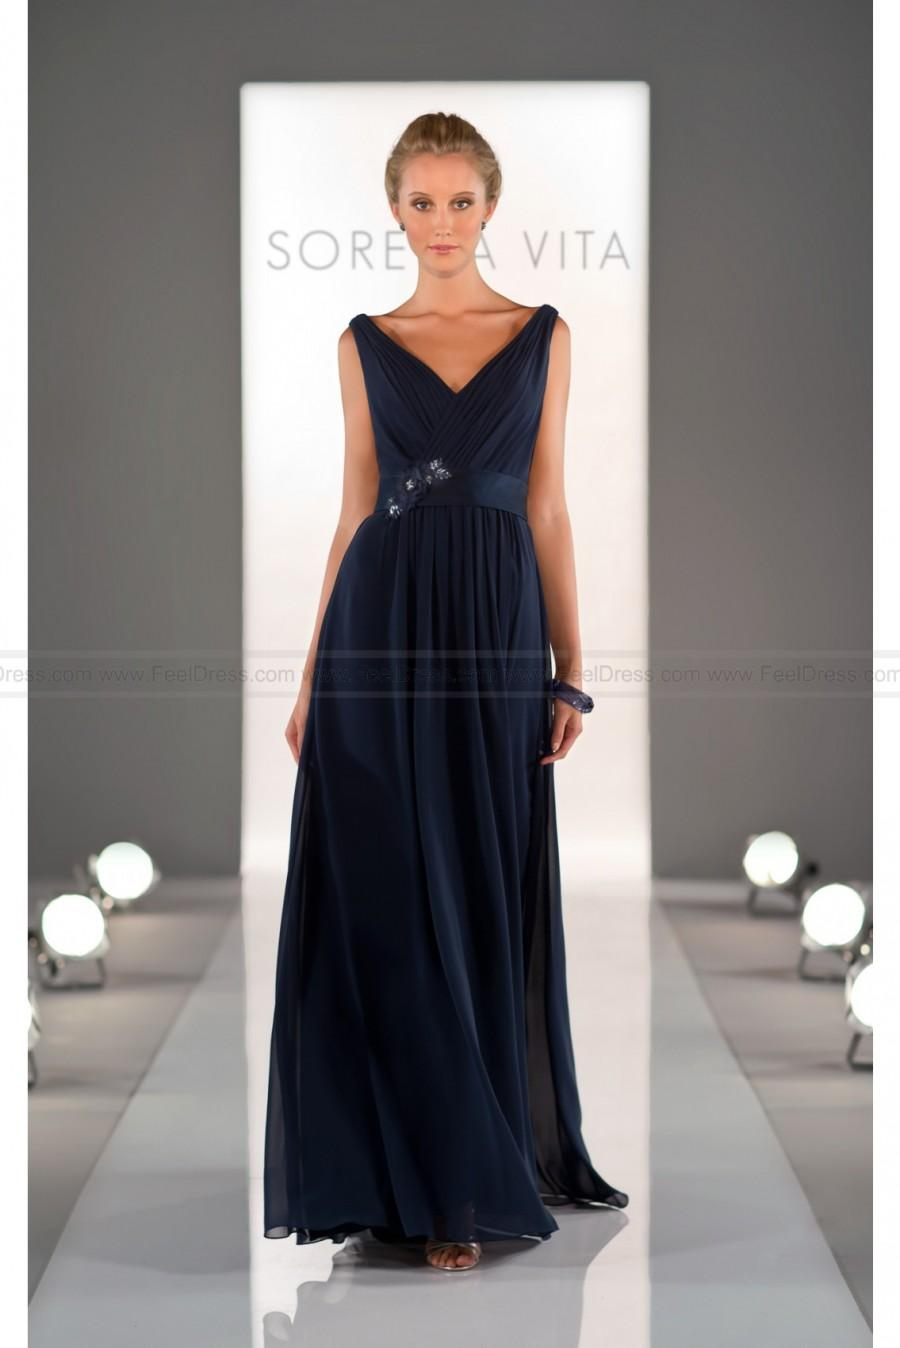 Wedding - Sorella Vita Navy Blue Bridesmaid Dress Style 8360